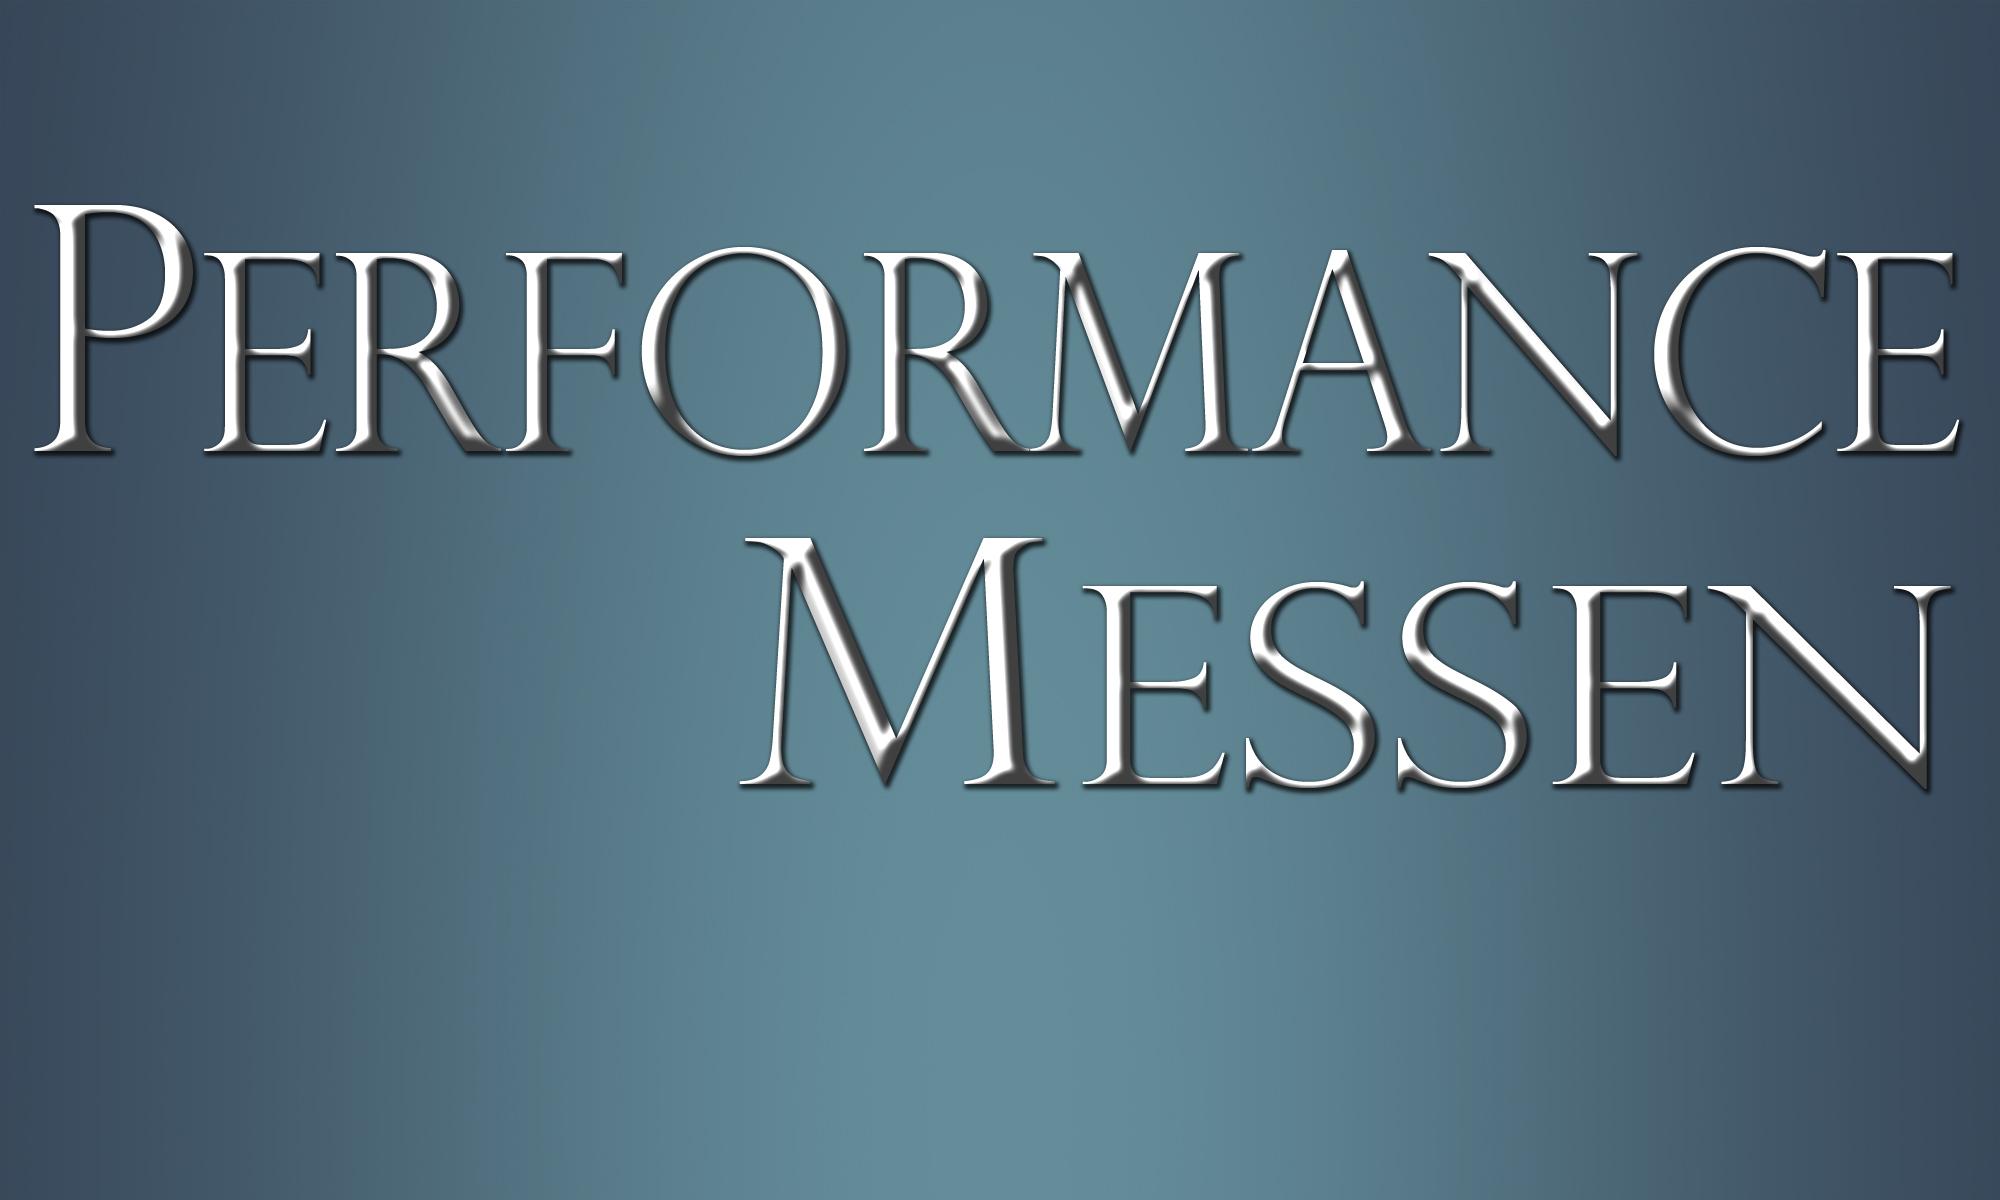 Performance messen